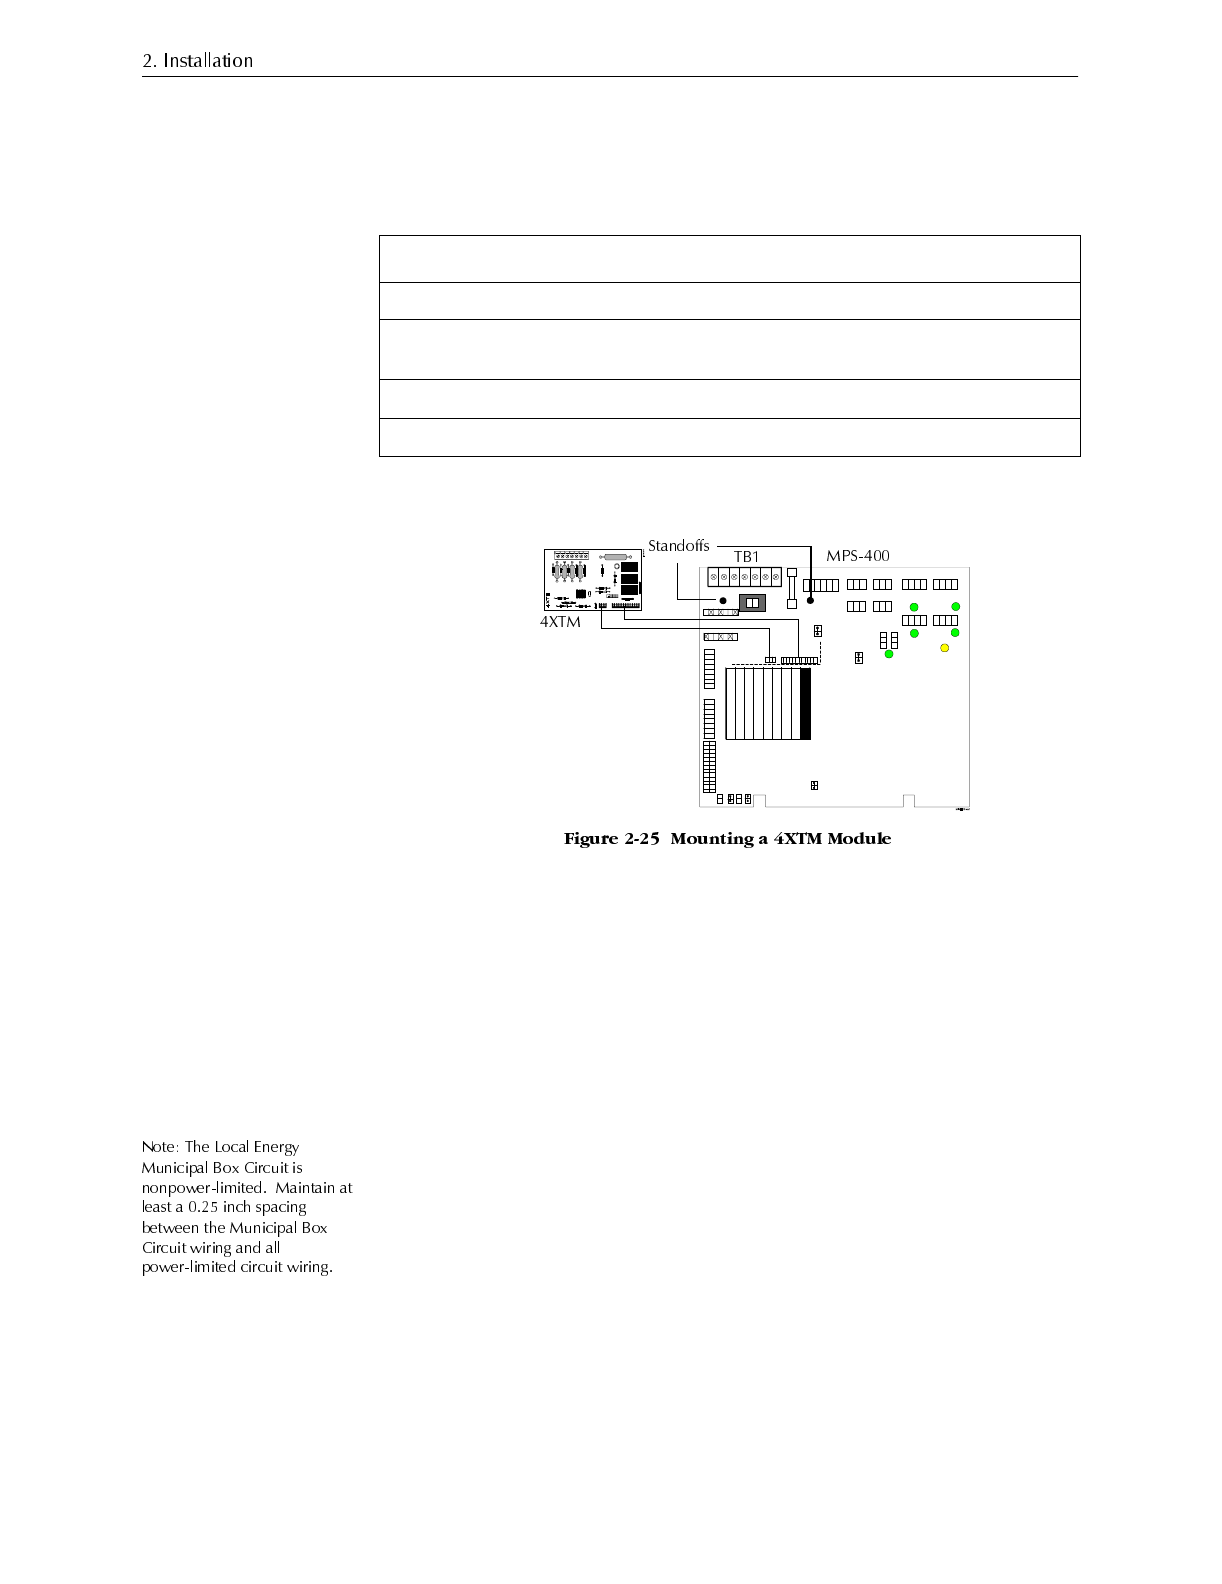 Aun40ia0 50710 Fire Alarm Wiring Diagram For A B Installing 4xtm Module Remote Station